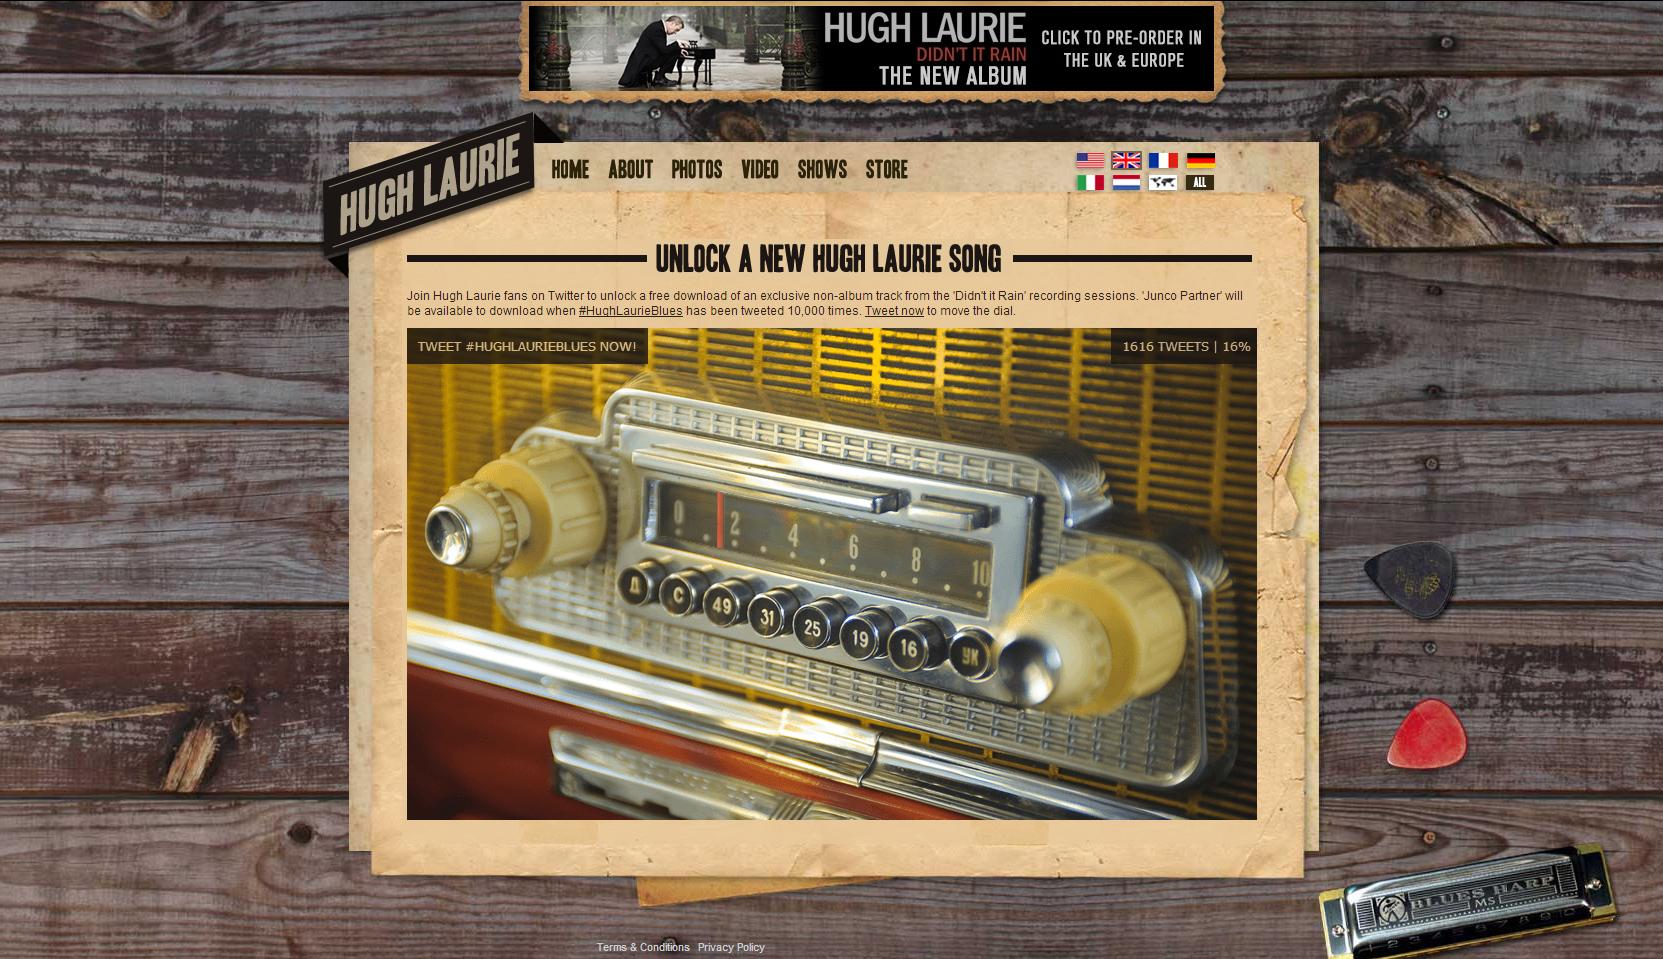 Hugh-Laurie-Tweet-to-Unlock-Campaign.png